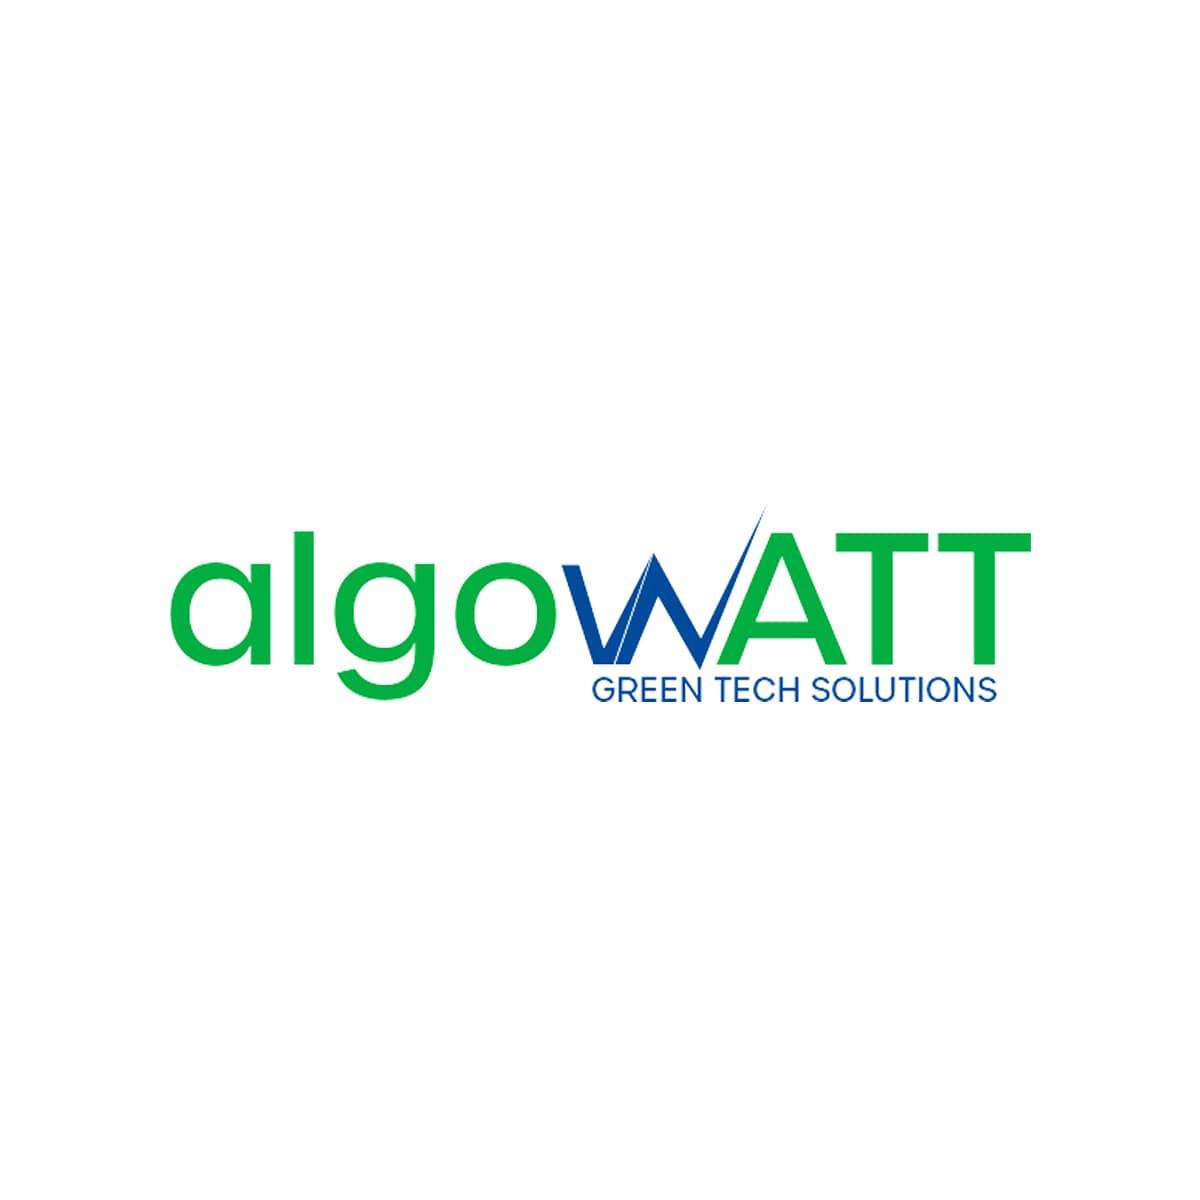 Algowatt, indebitamento in leggero aumento a febbraio 2020